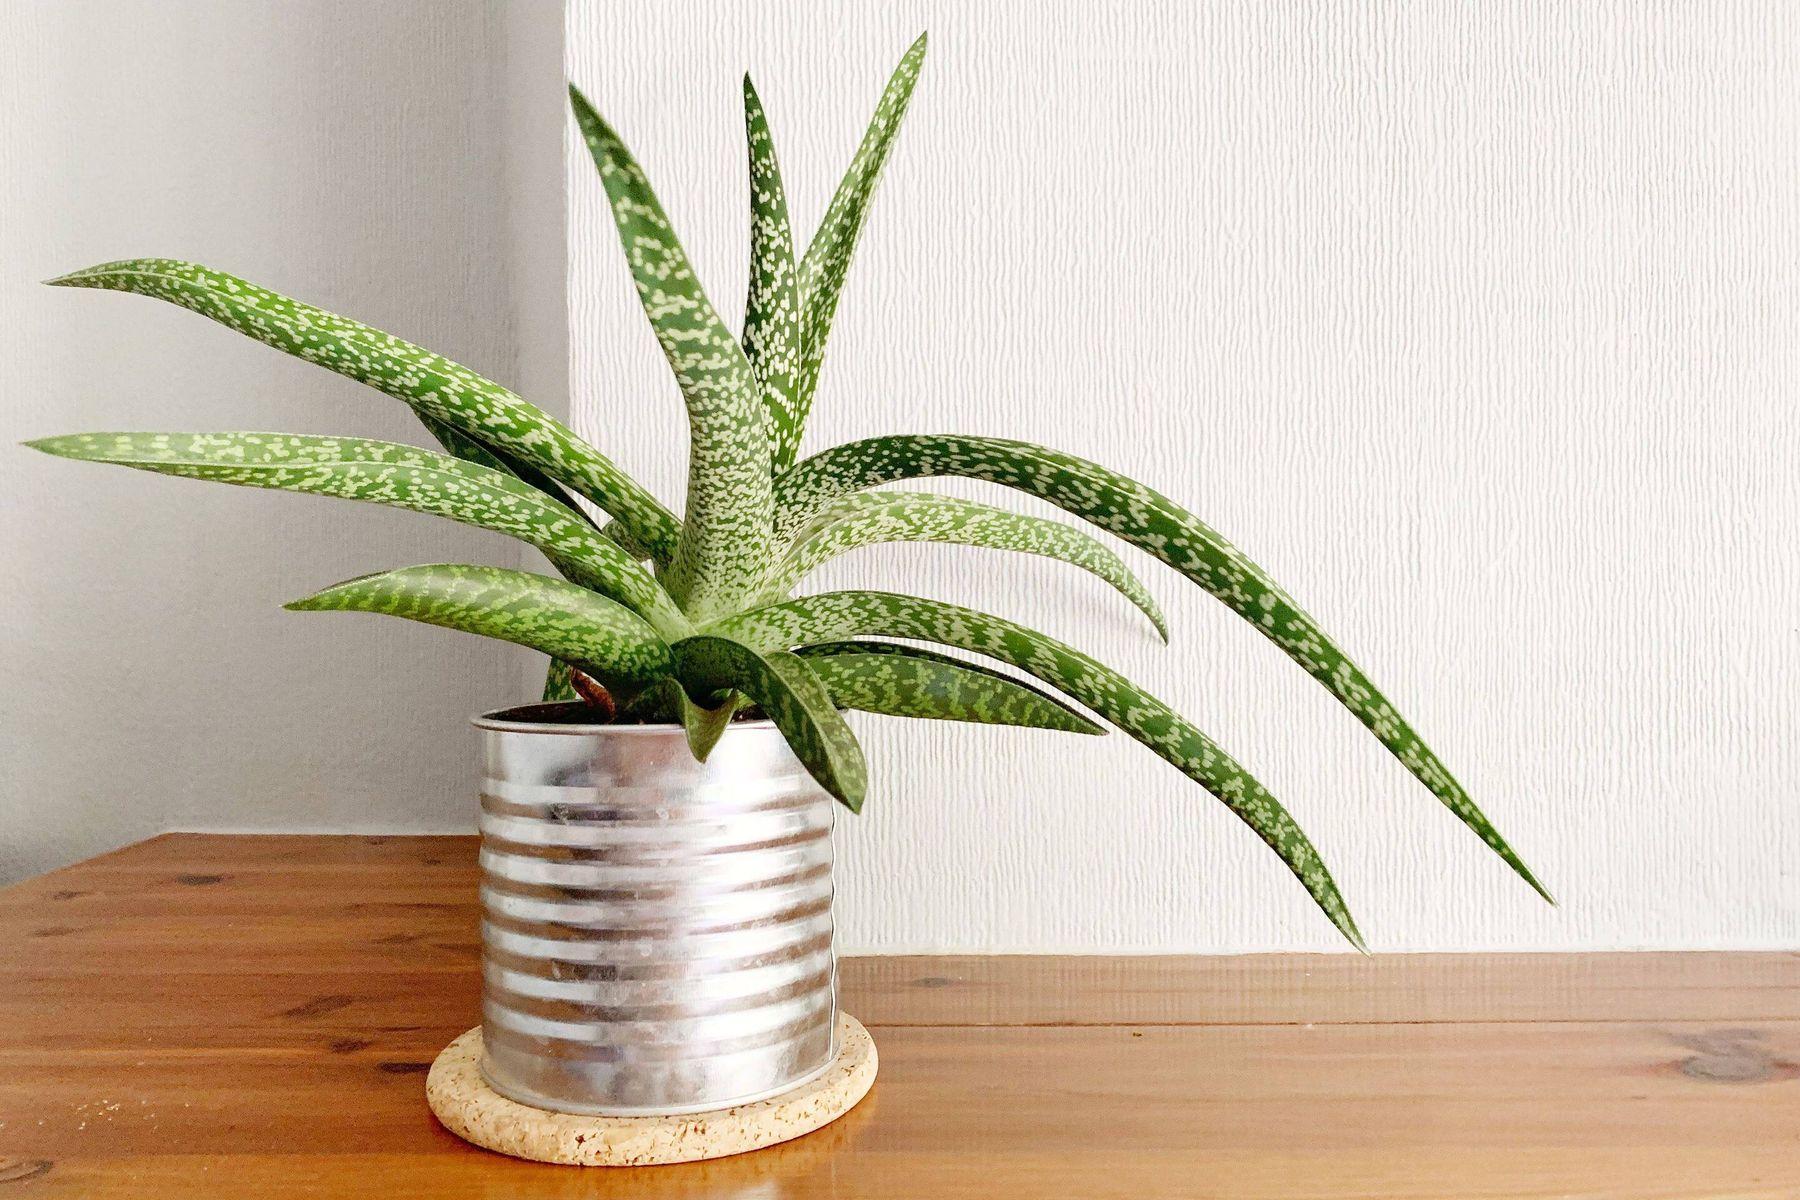 plante en pot en étain recyclé